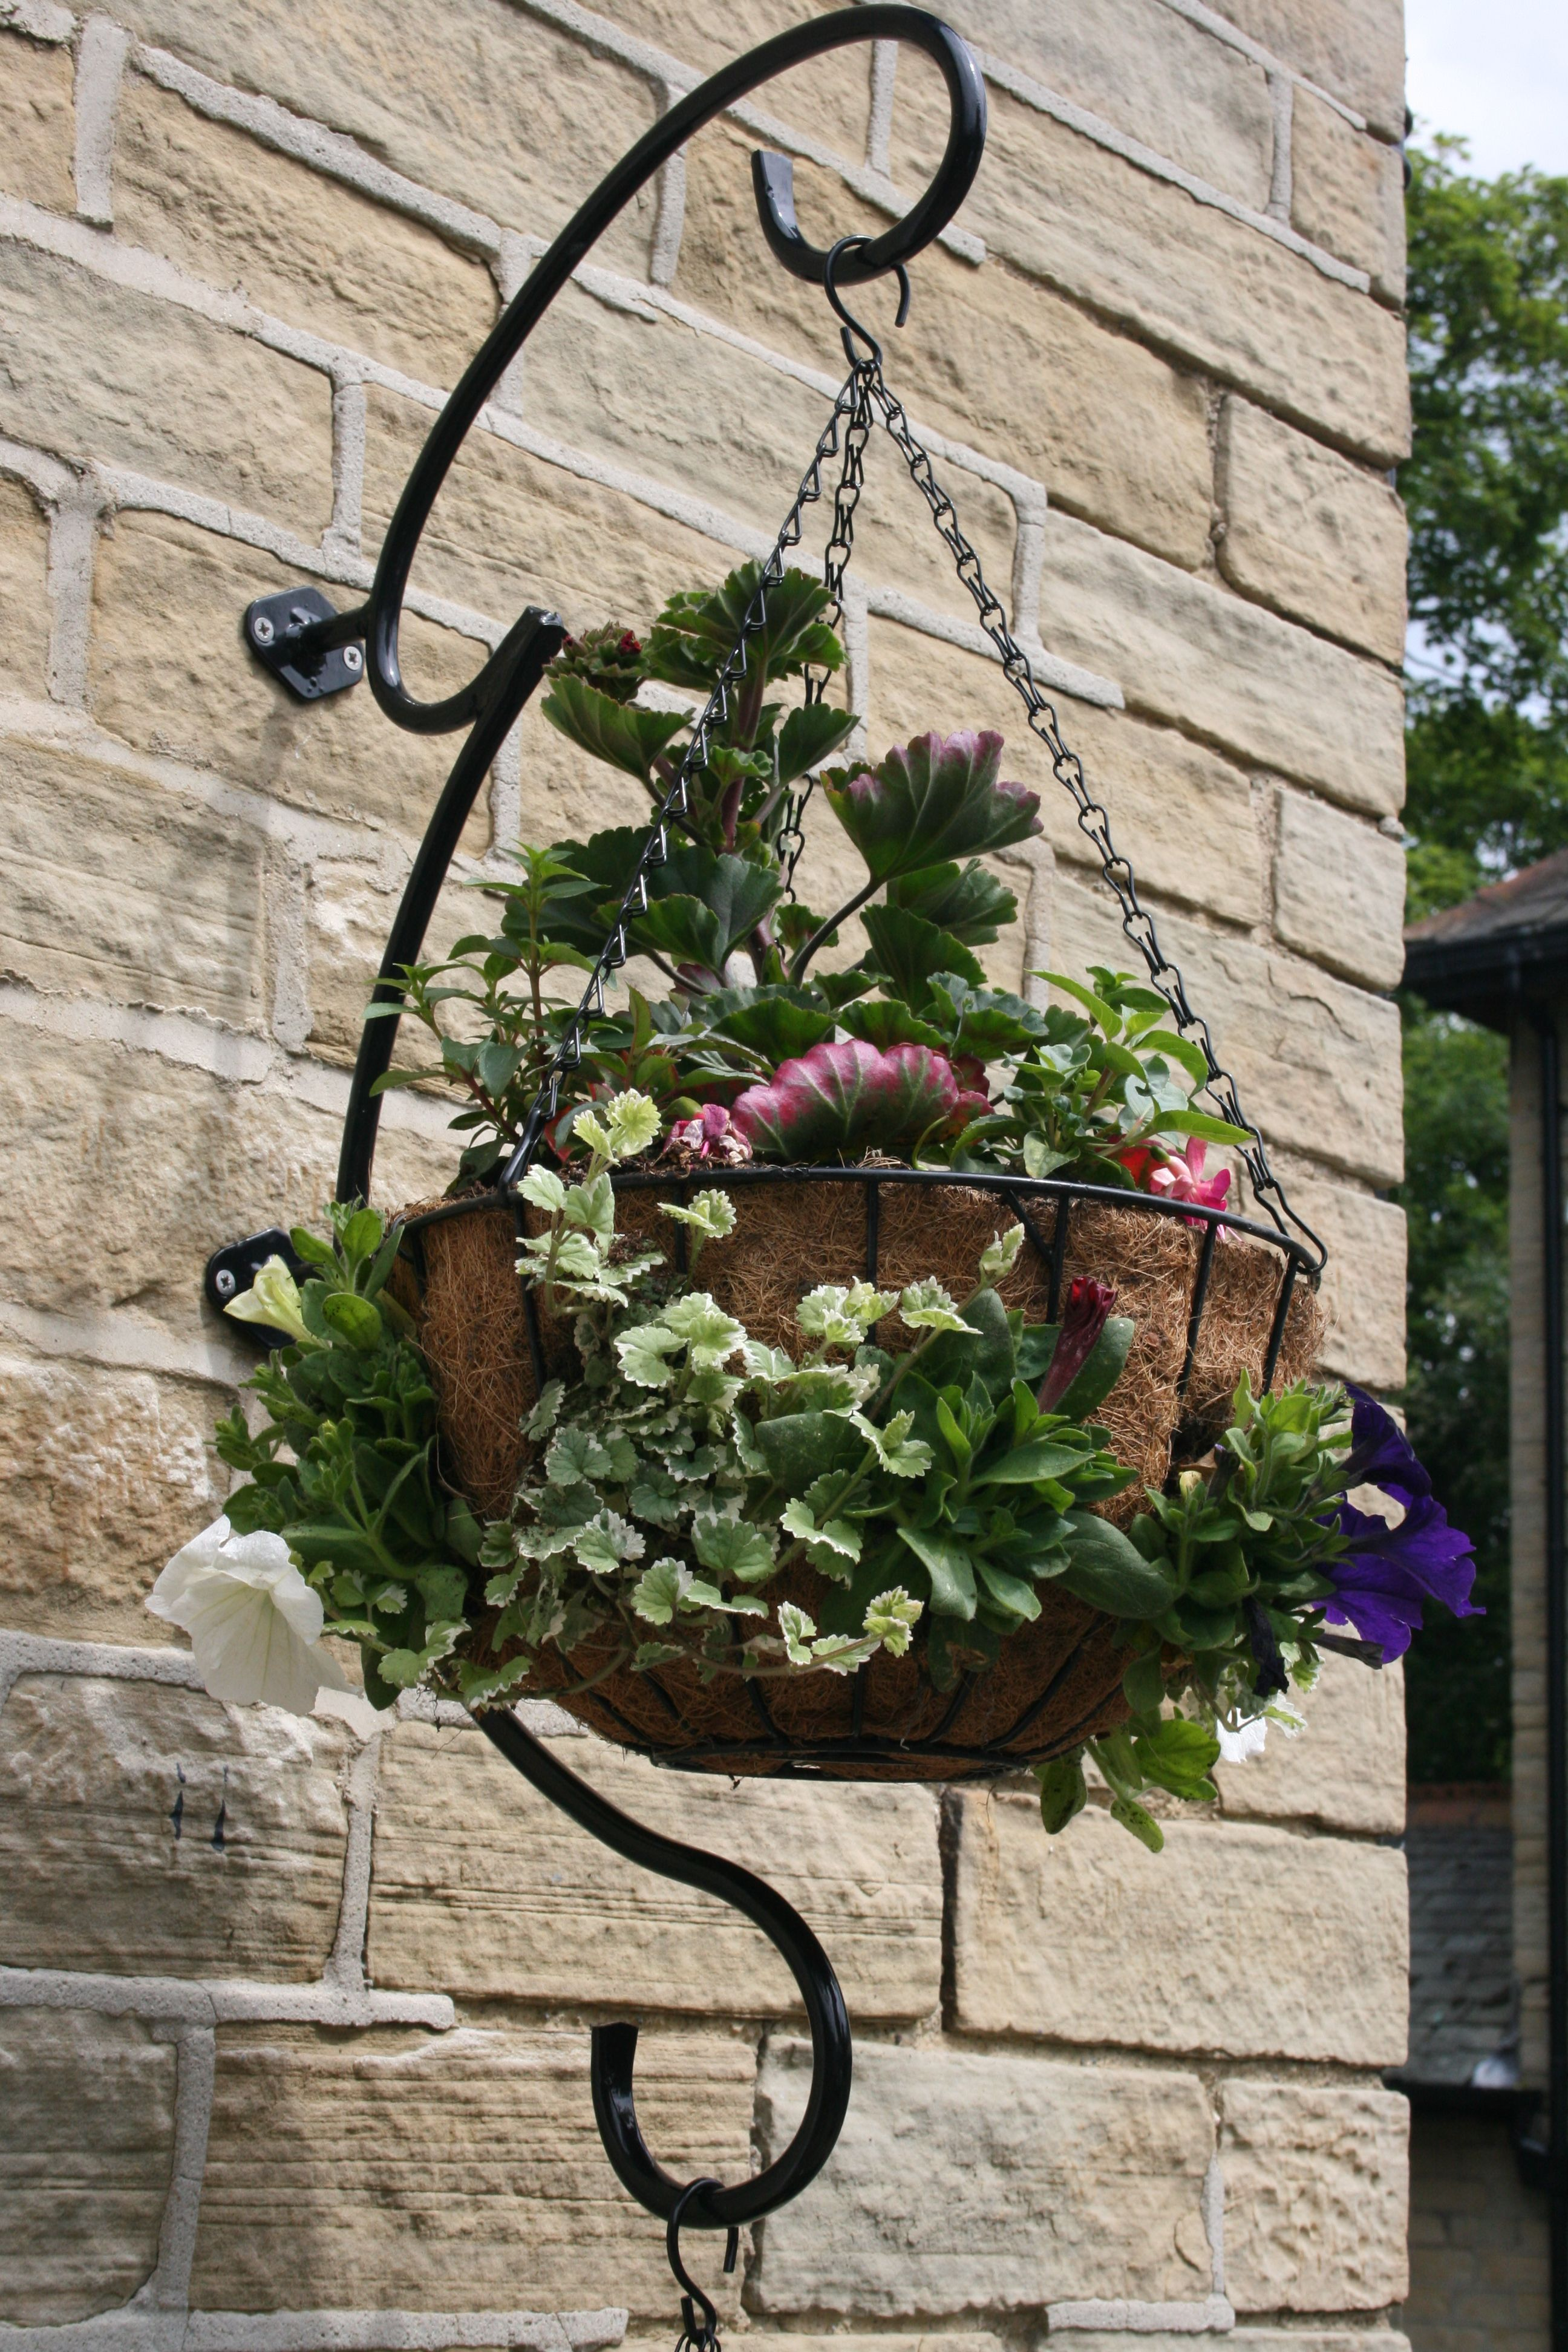 The Round Hand Hanging Basket Bracket Is Designed To Elegantly